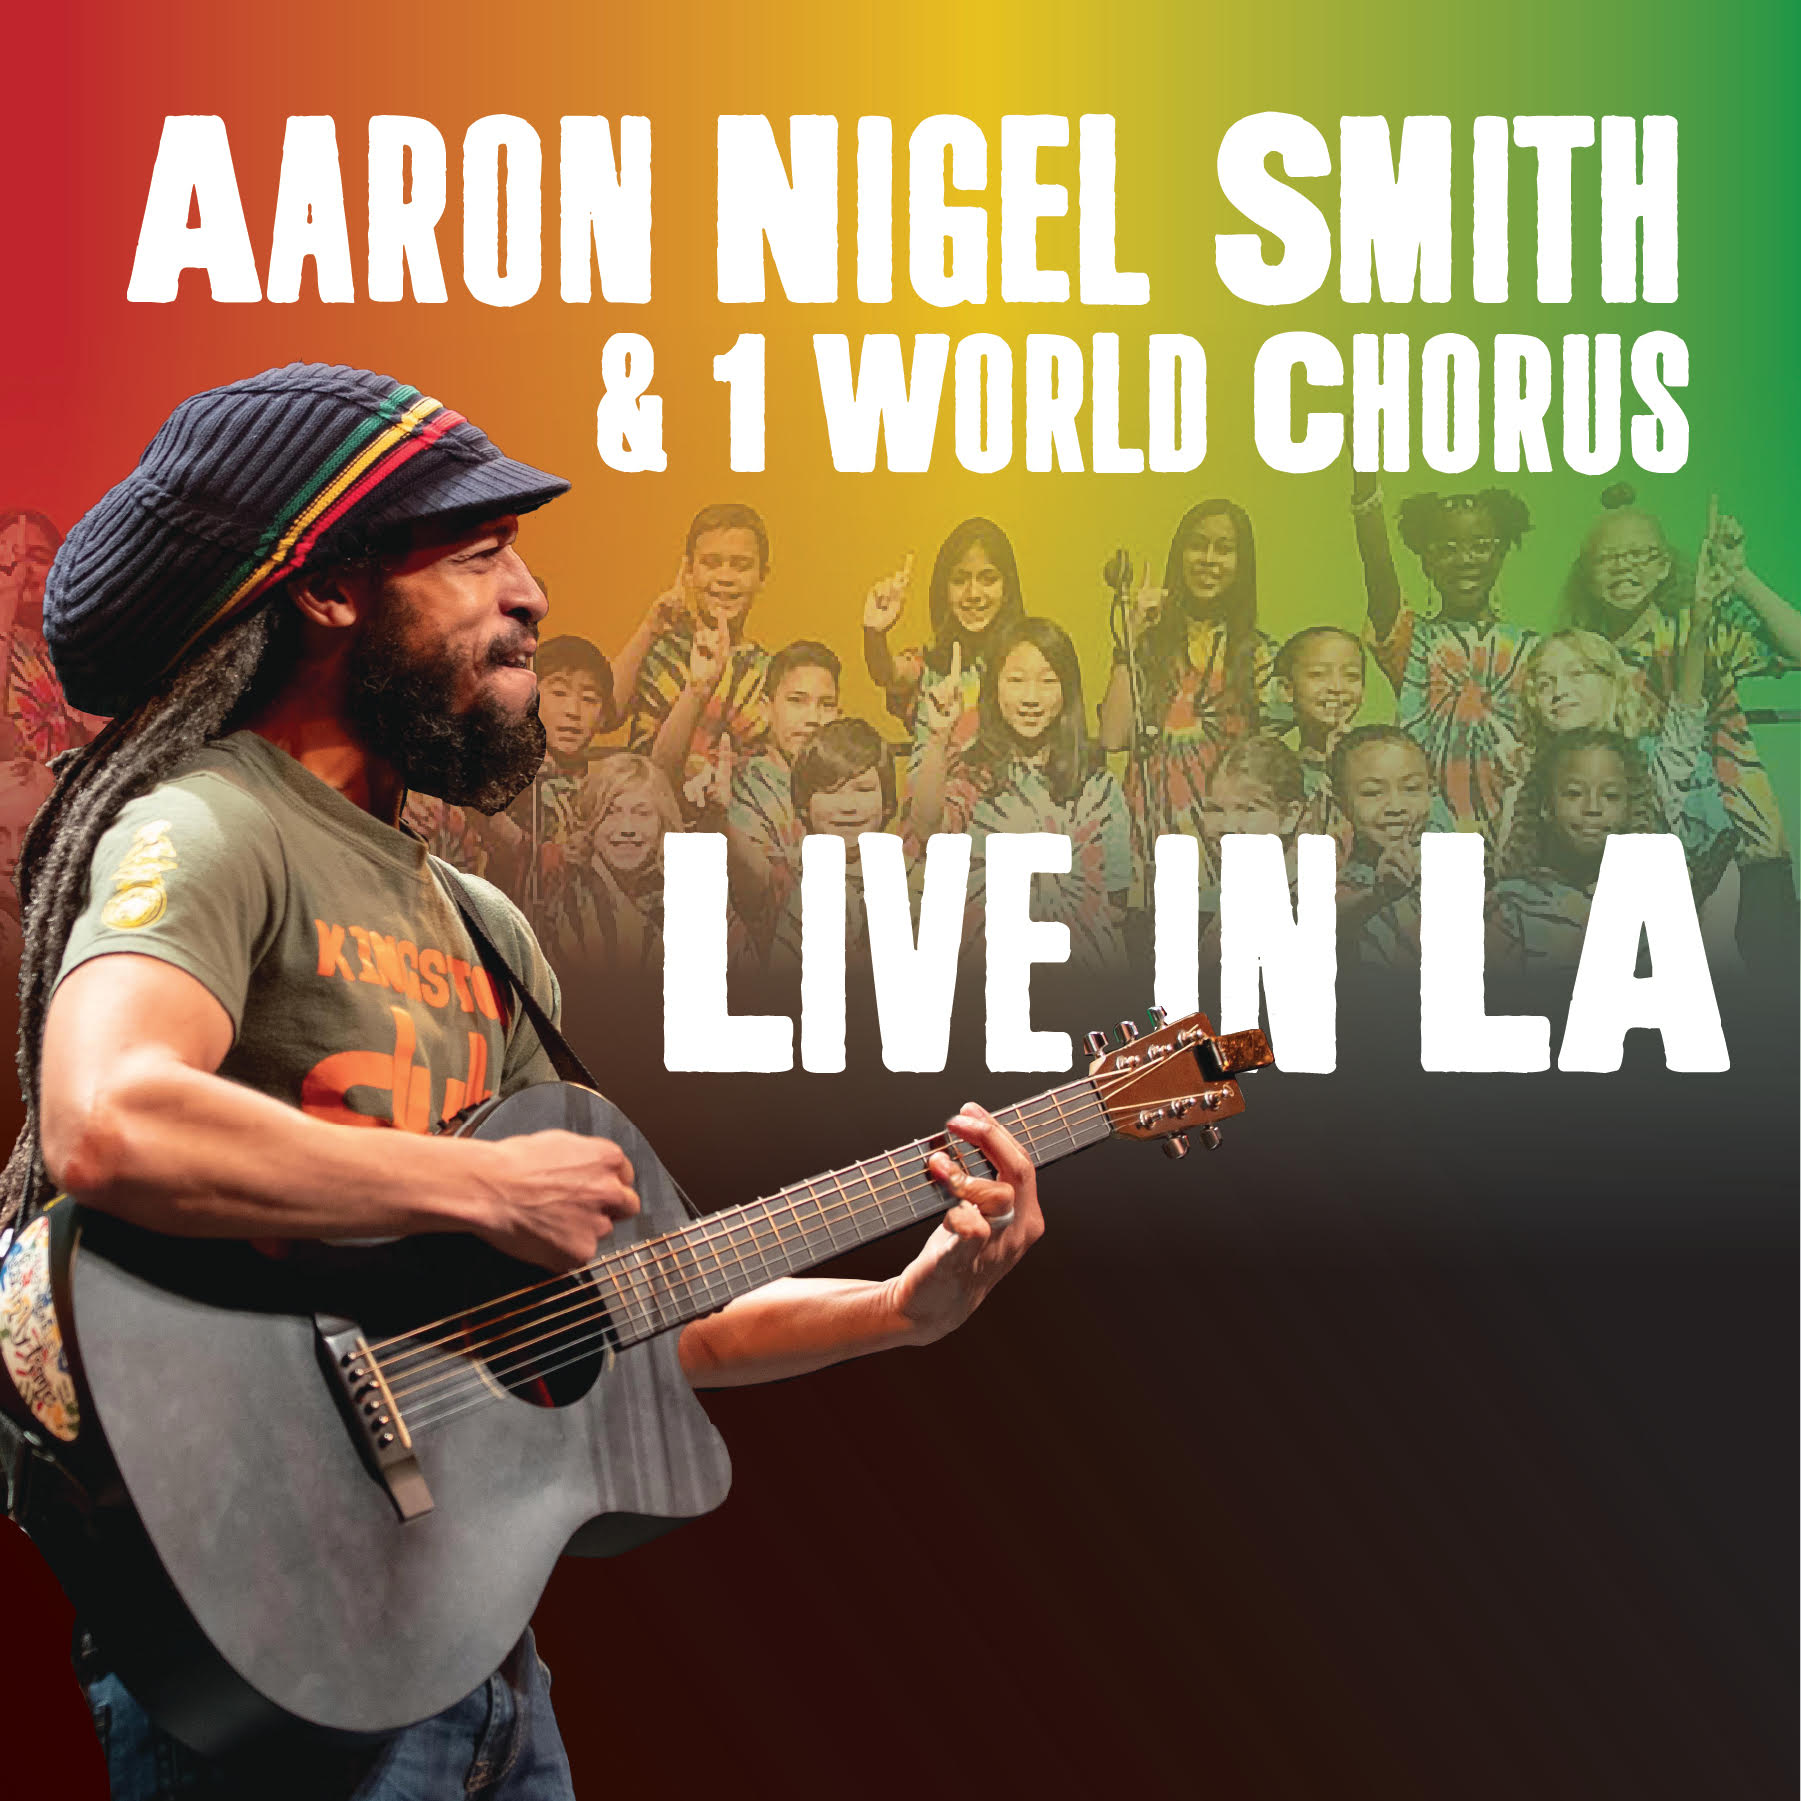 Aaron Nigel Smith & 1 World Chorus Live